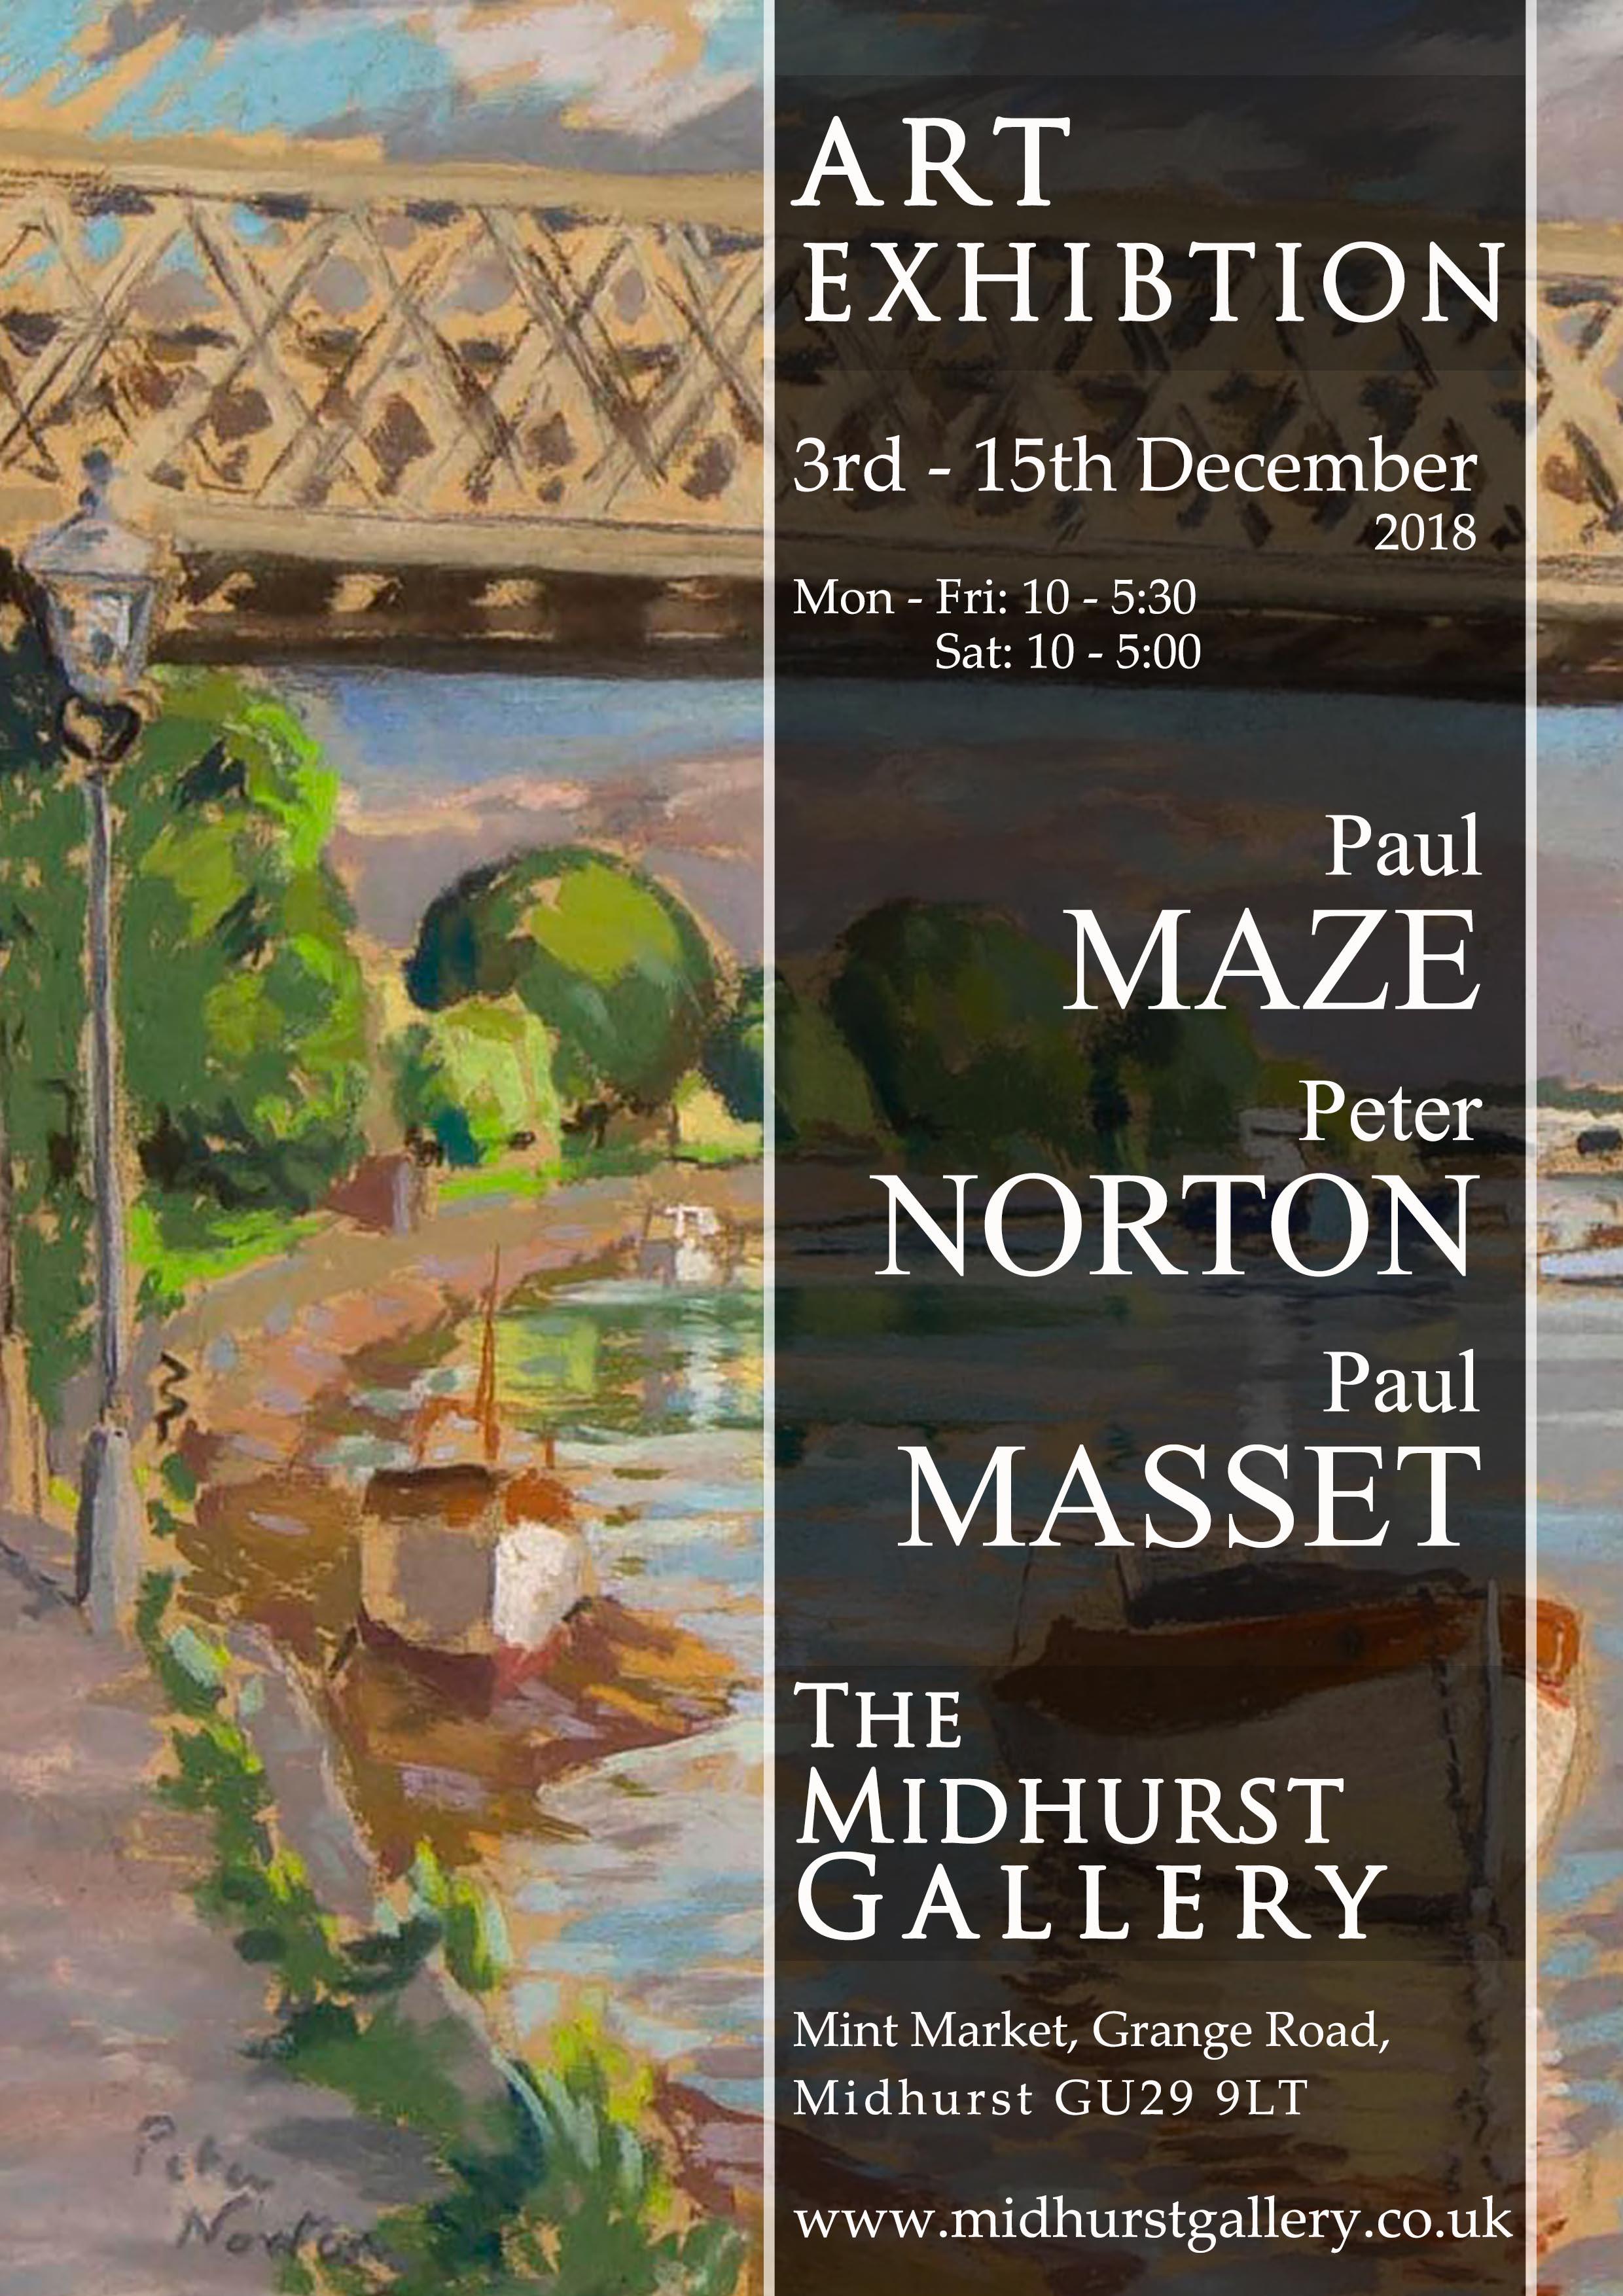 Paul MAZE, Peter NORTON, Paul MASSET Exhibition - December 2018 - The Midurst Gallery.jpg